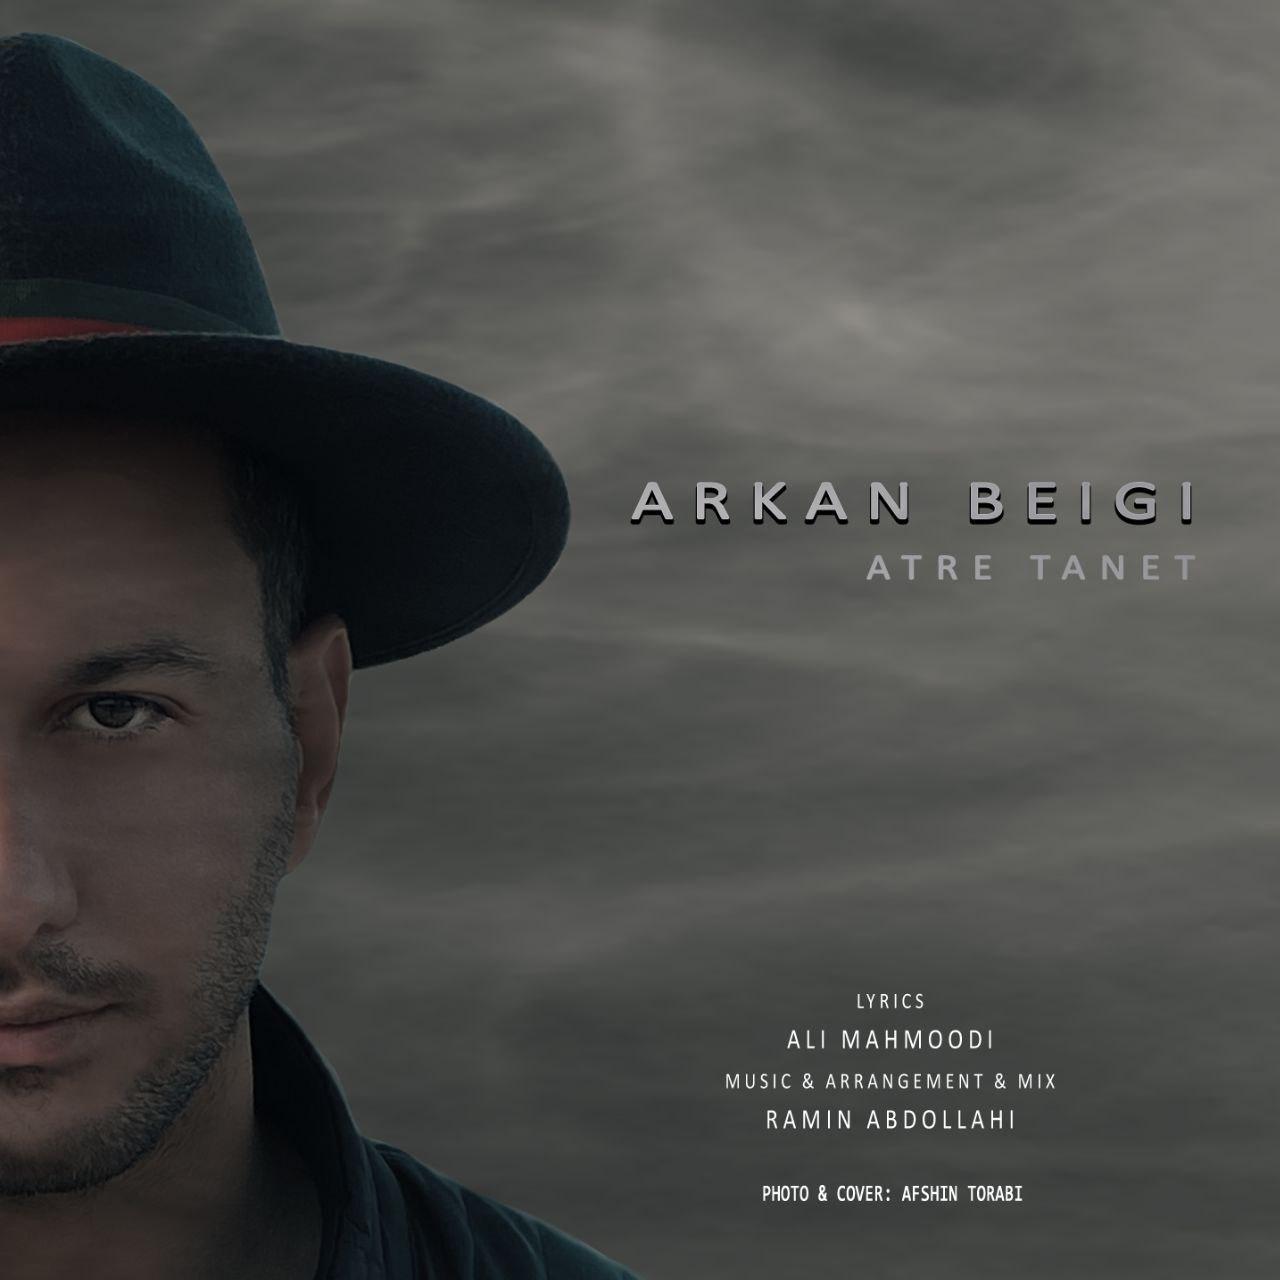 Arkan Beigi – Atre Tanet